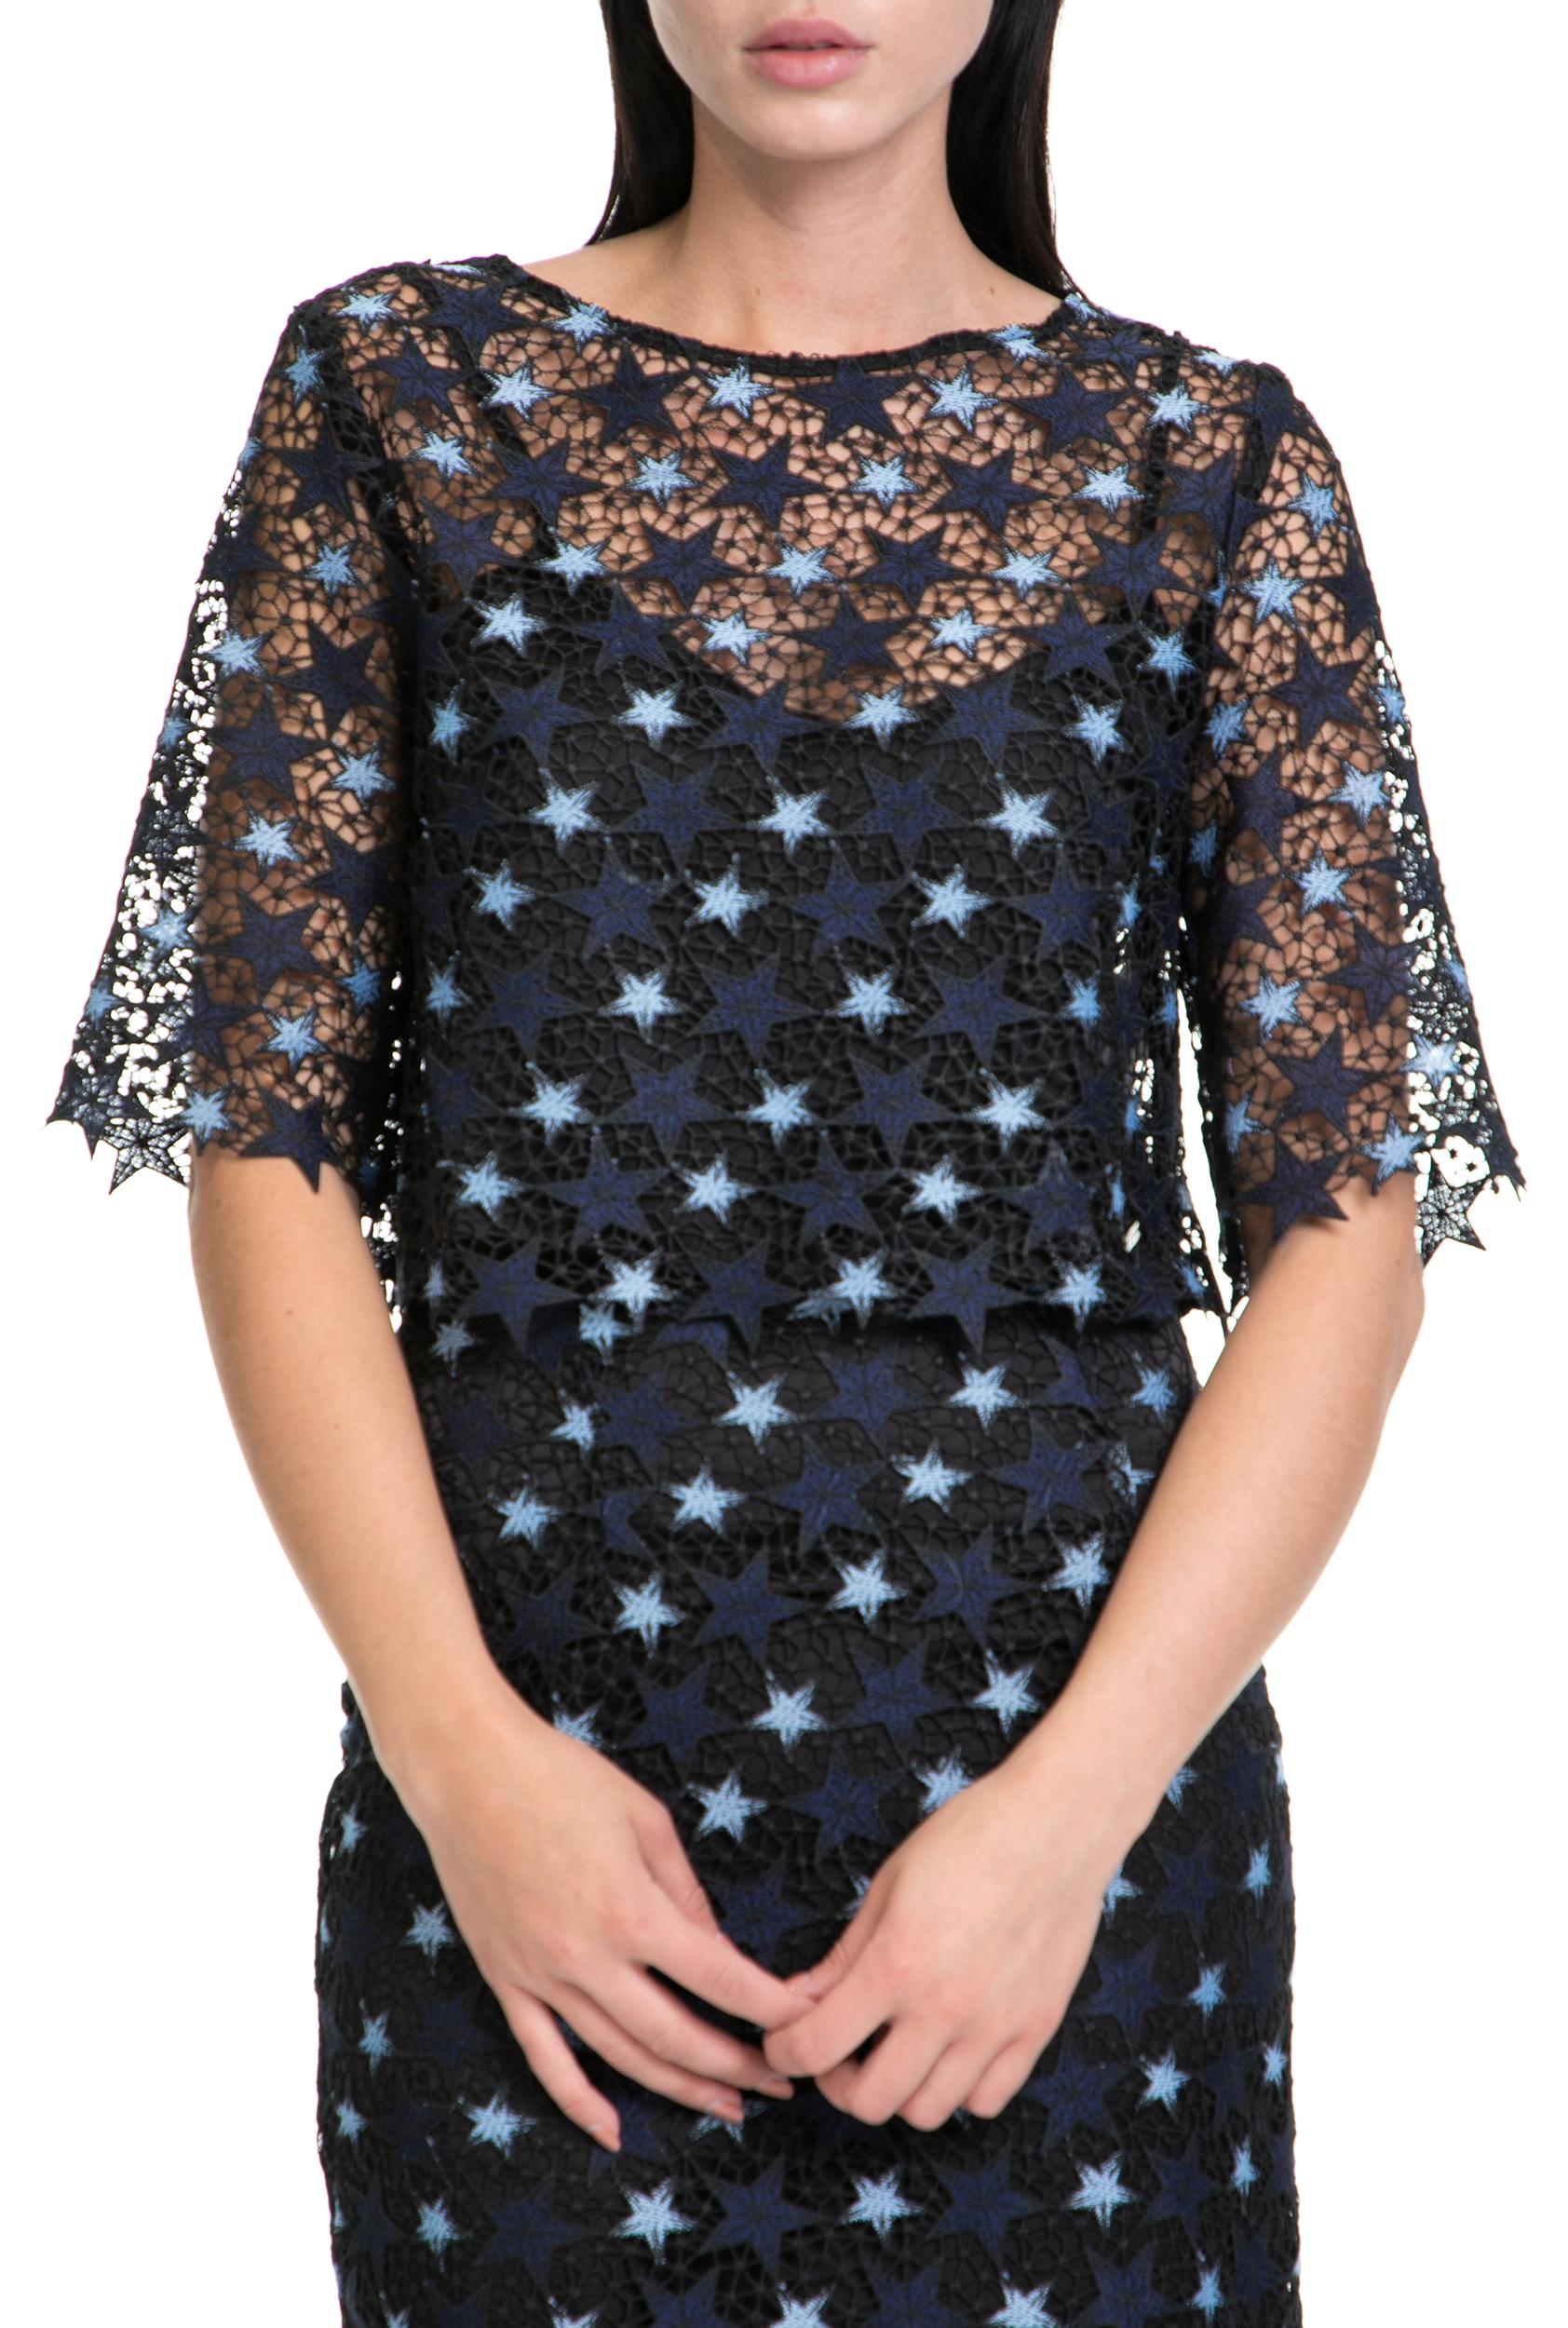 e6729ab9da4f GUESS - Γυναικεία μπλούζα LEA GUESS μαύρη-μπλε ⋆ pressmedoll.gr